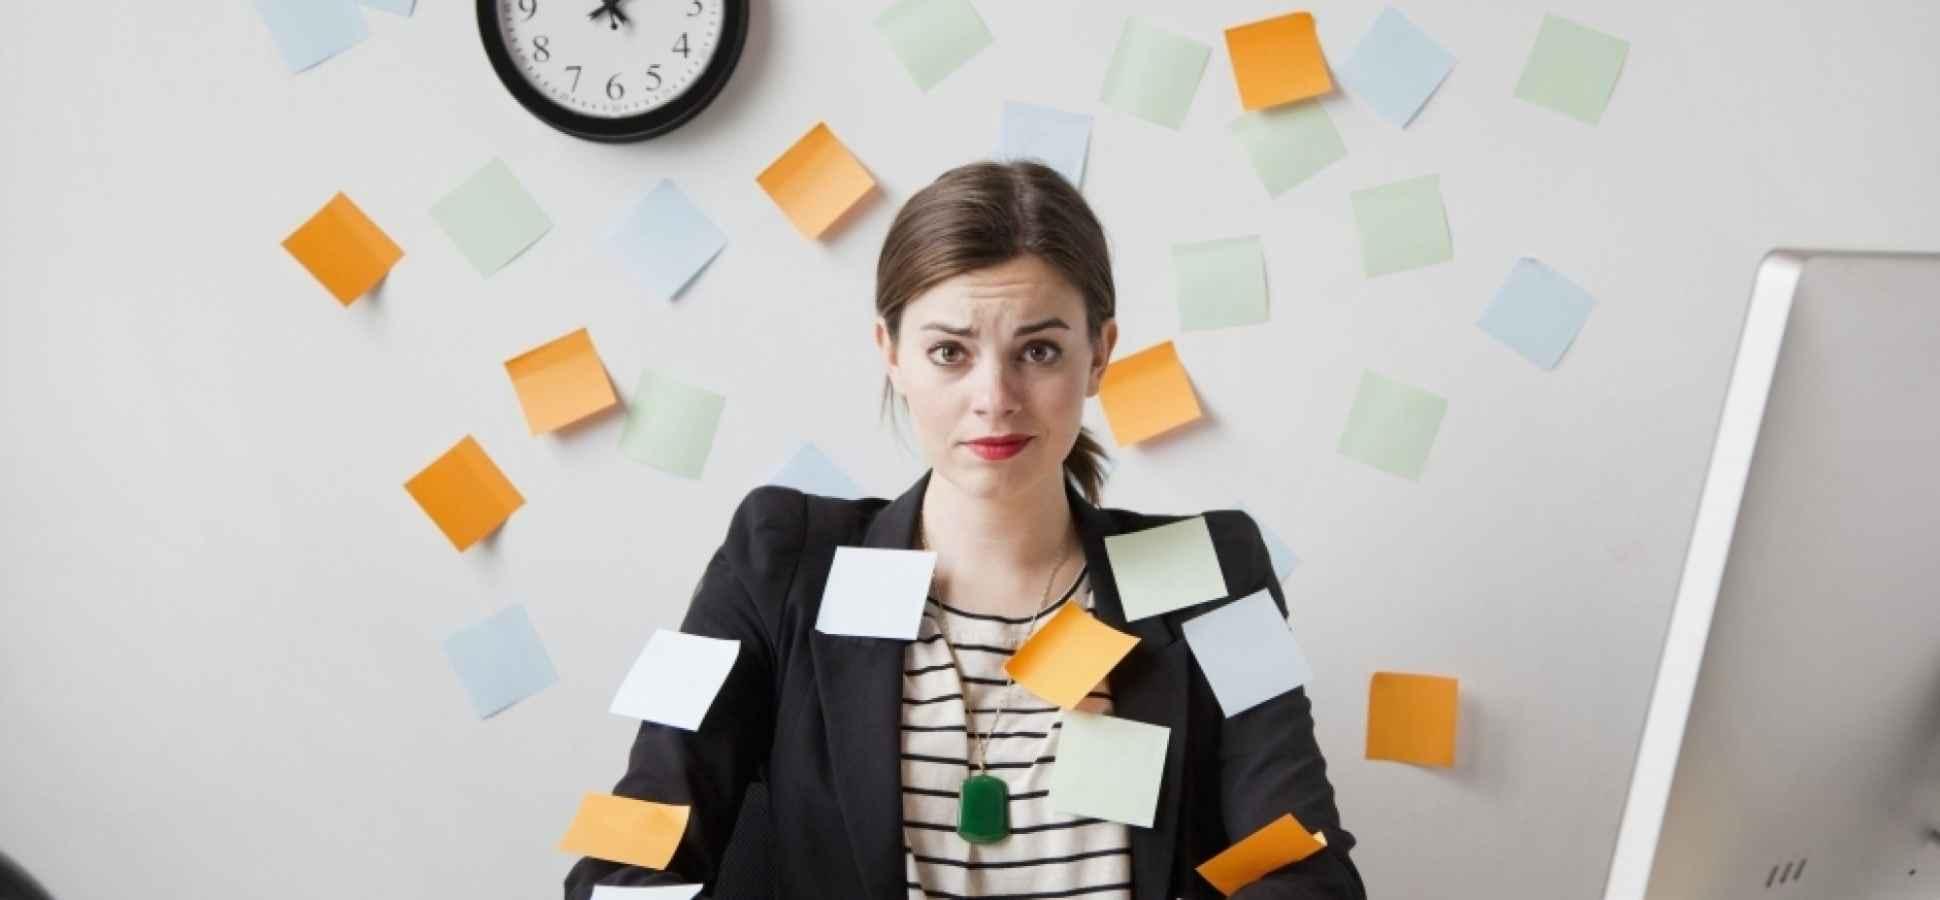 5 Ways to Work Smarter, Not Harder